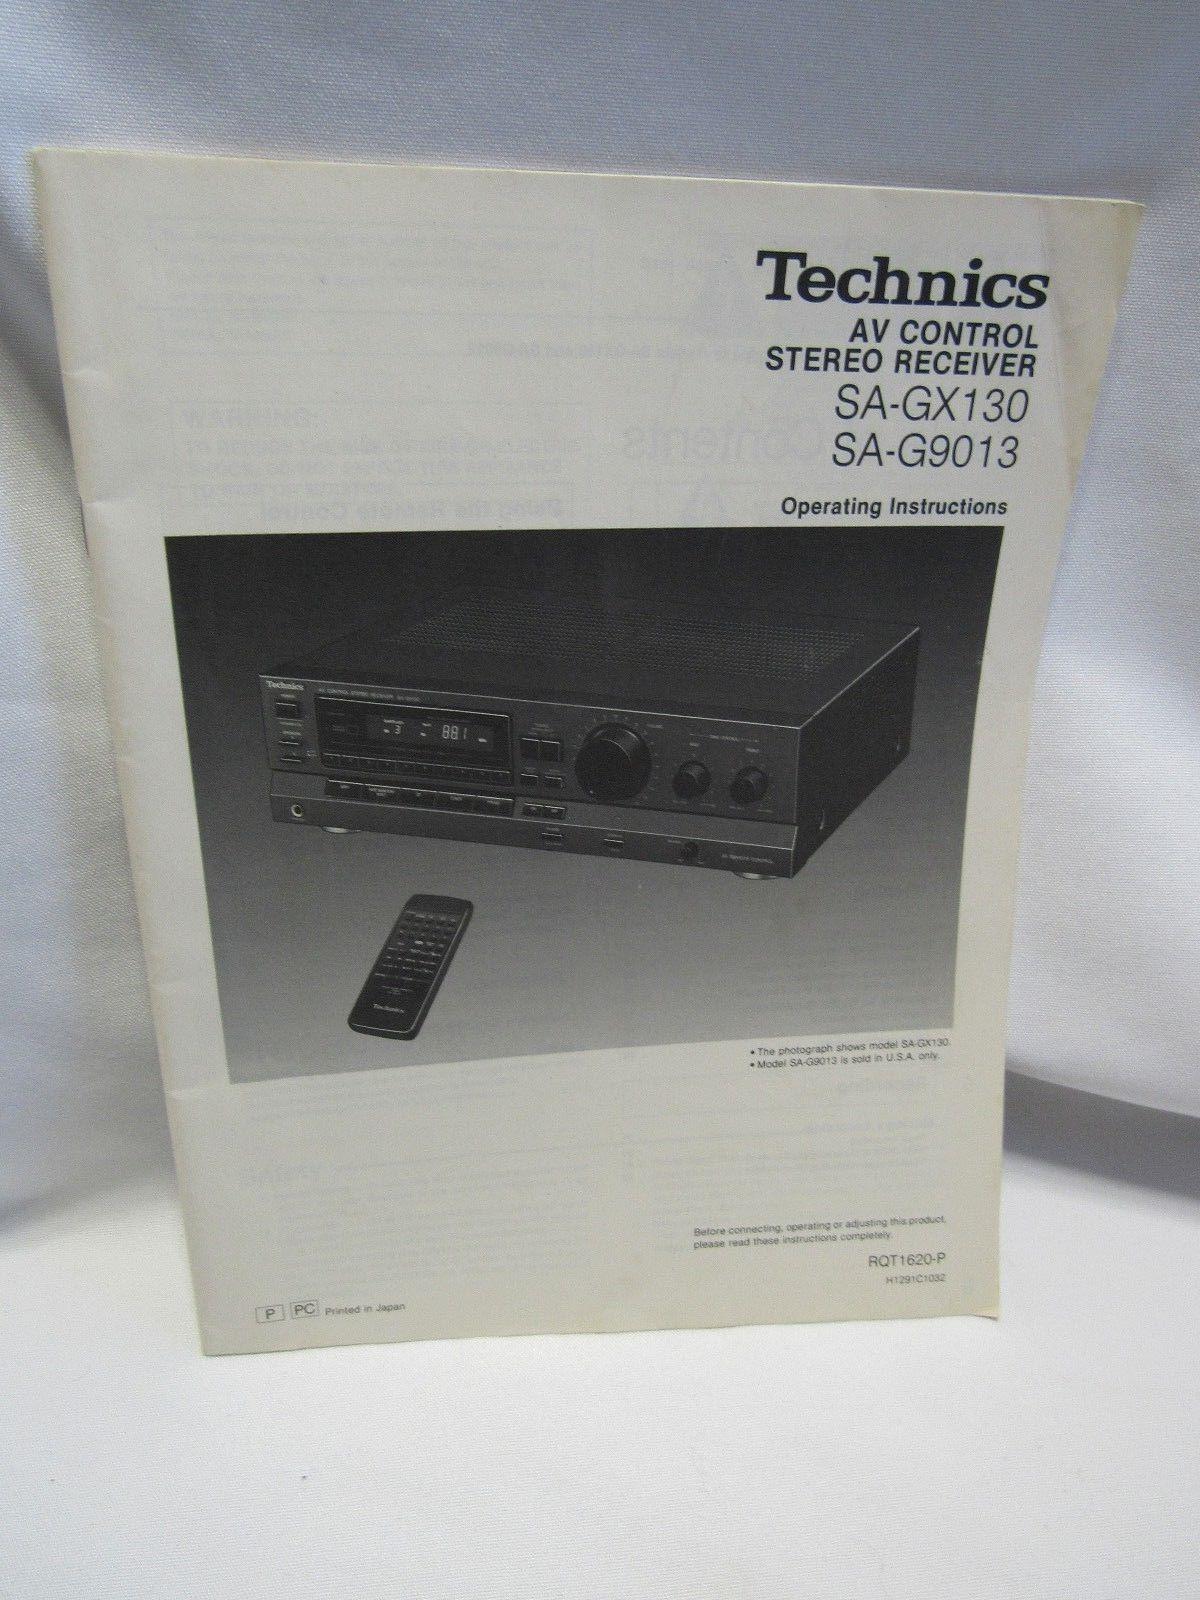 Technics SA-GX130 SA-G9013 AV Control Receiver Operating Instruction Manual